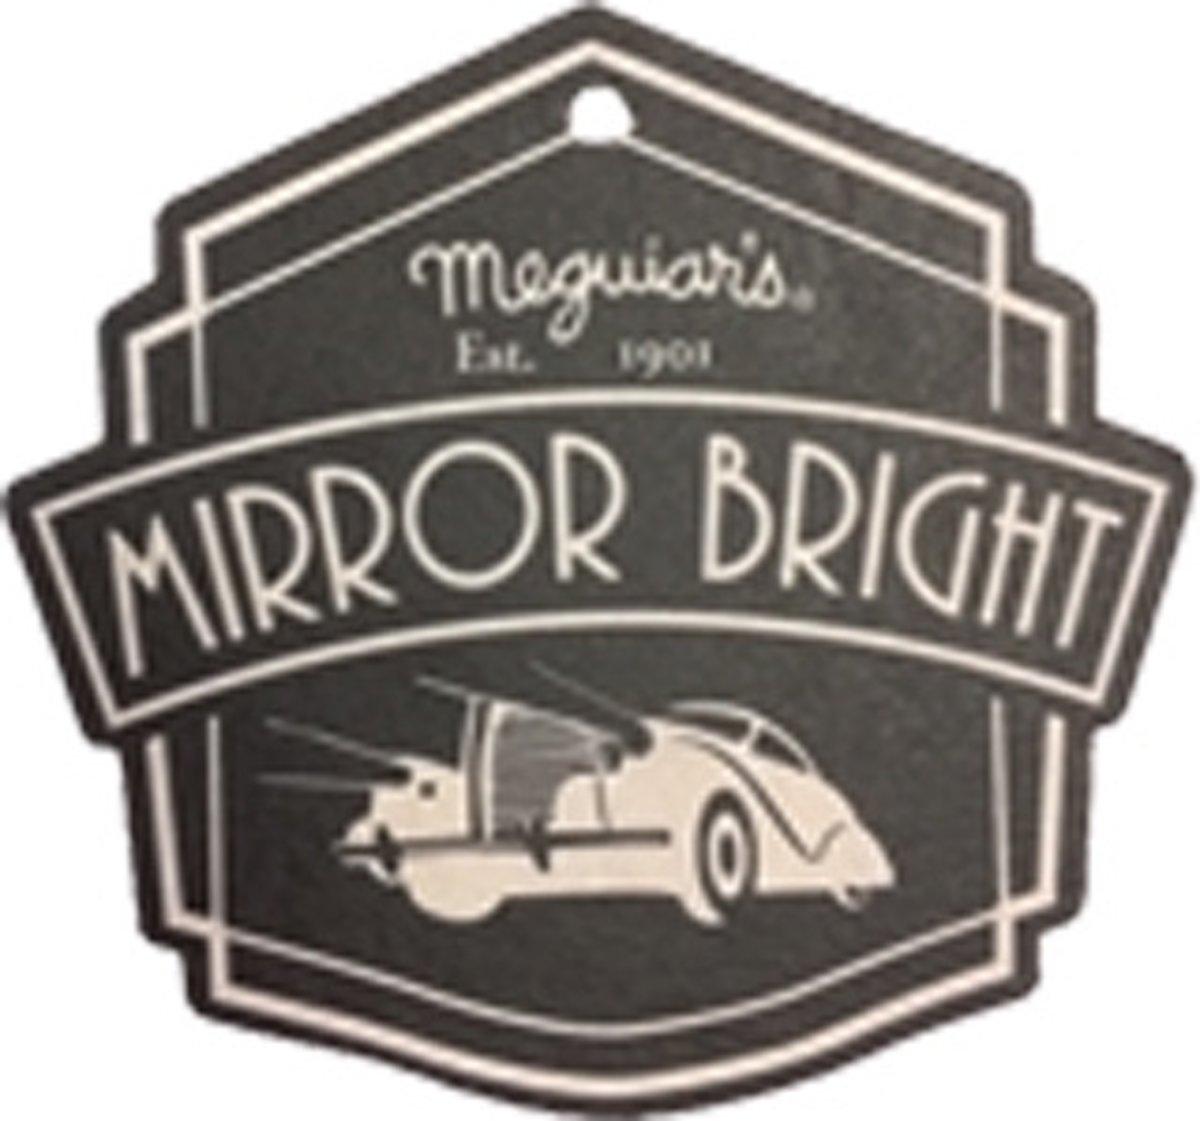 Meguiars Mirror Bright Air Freshener Cherry